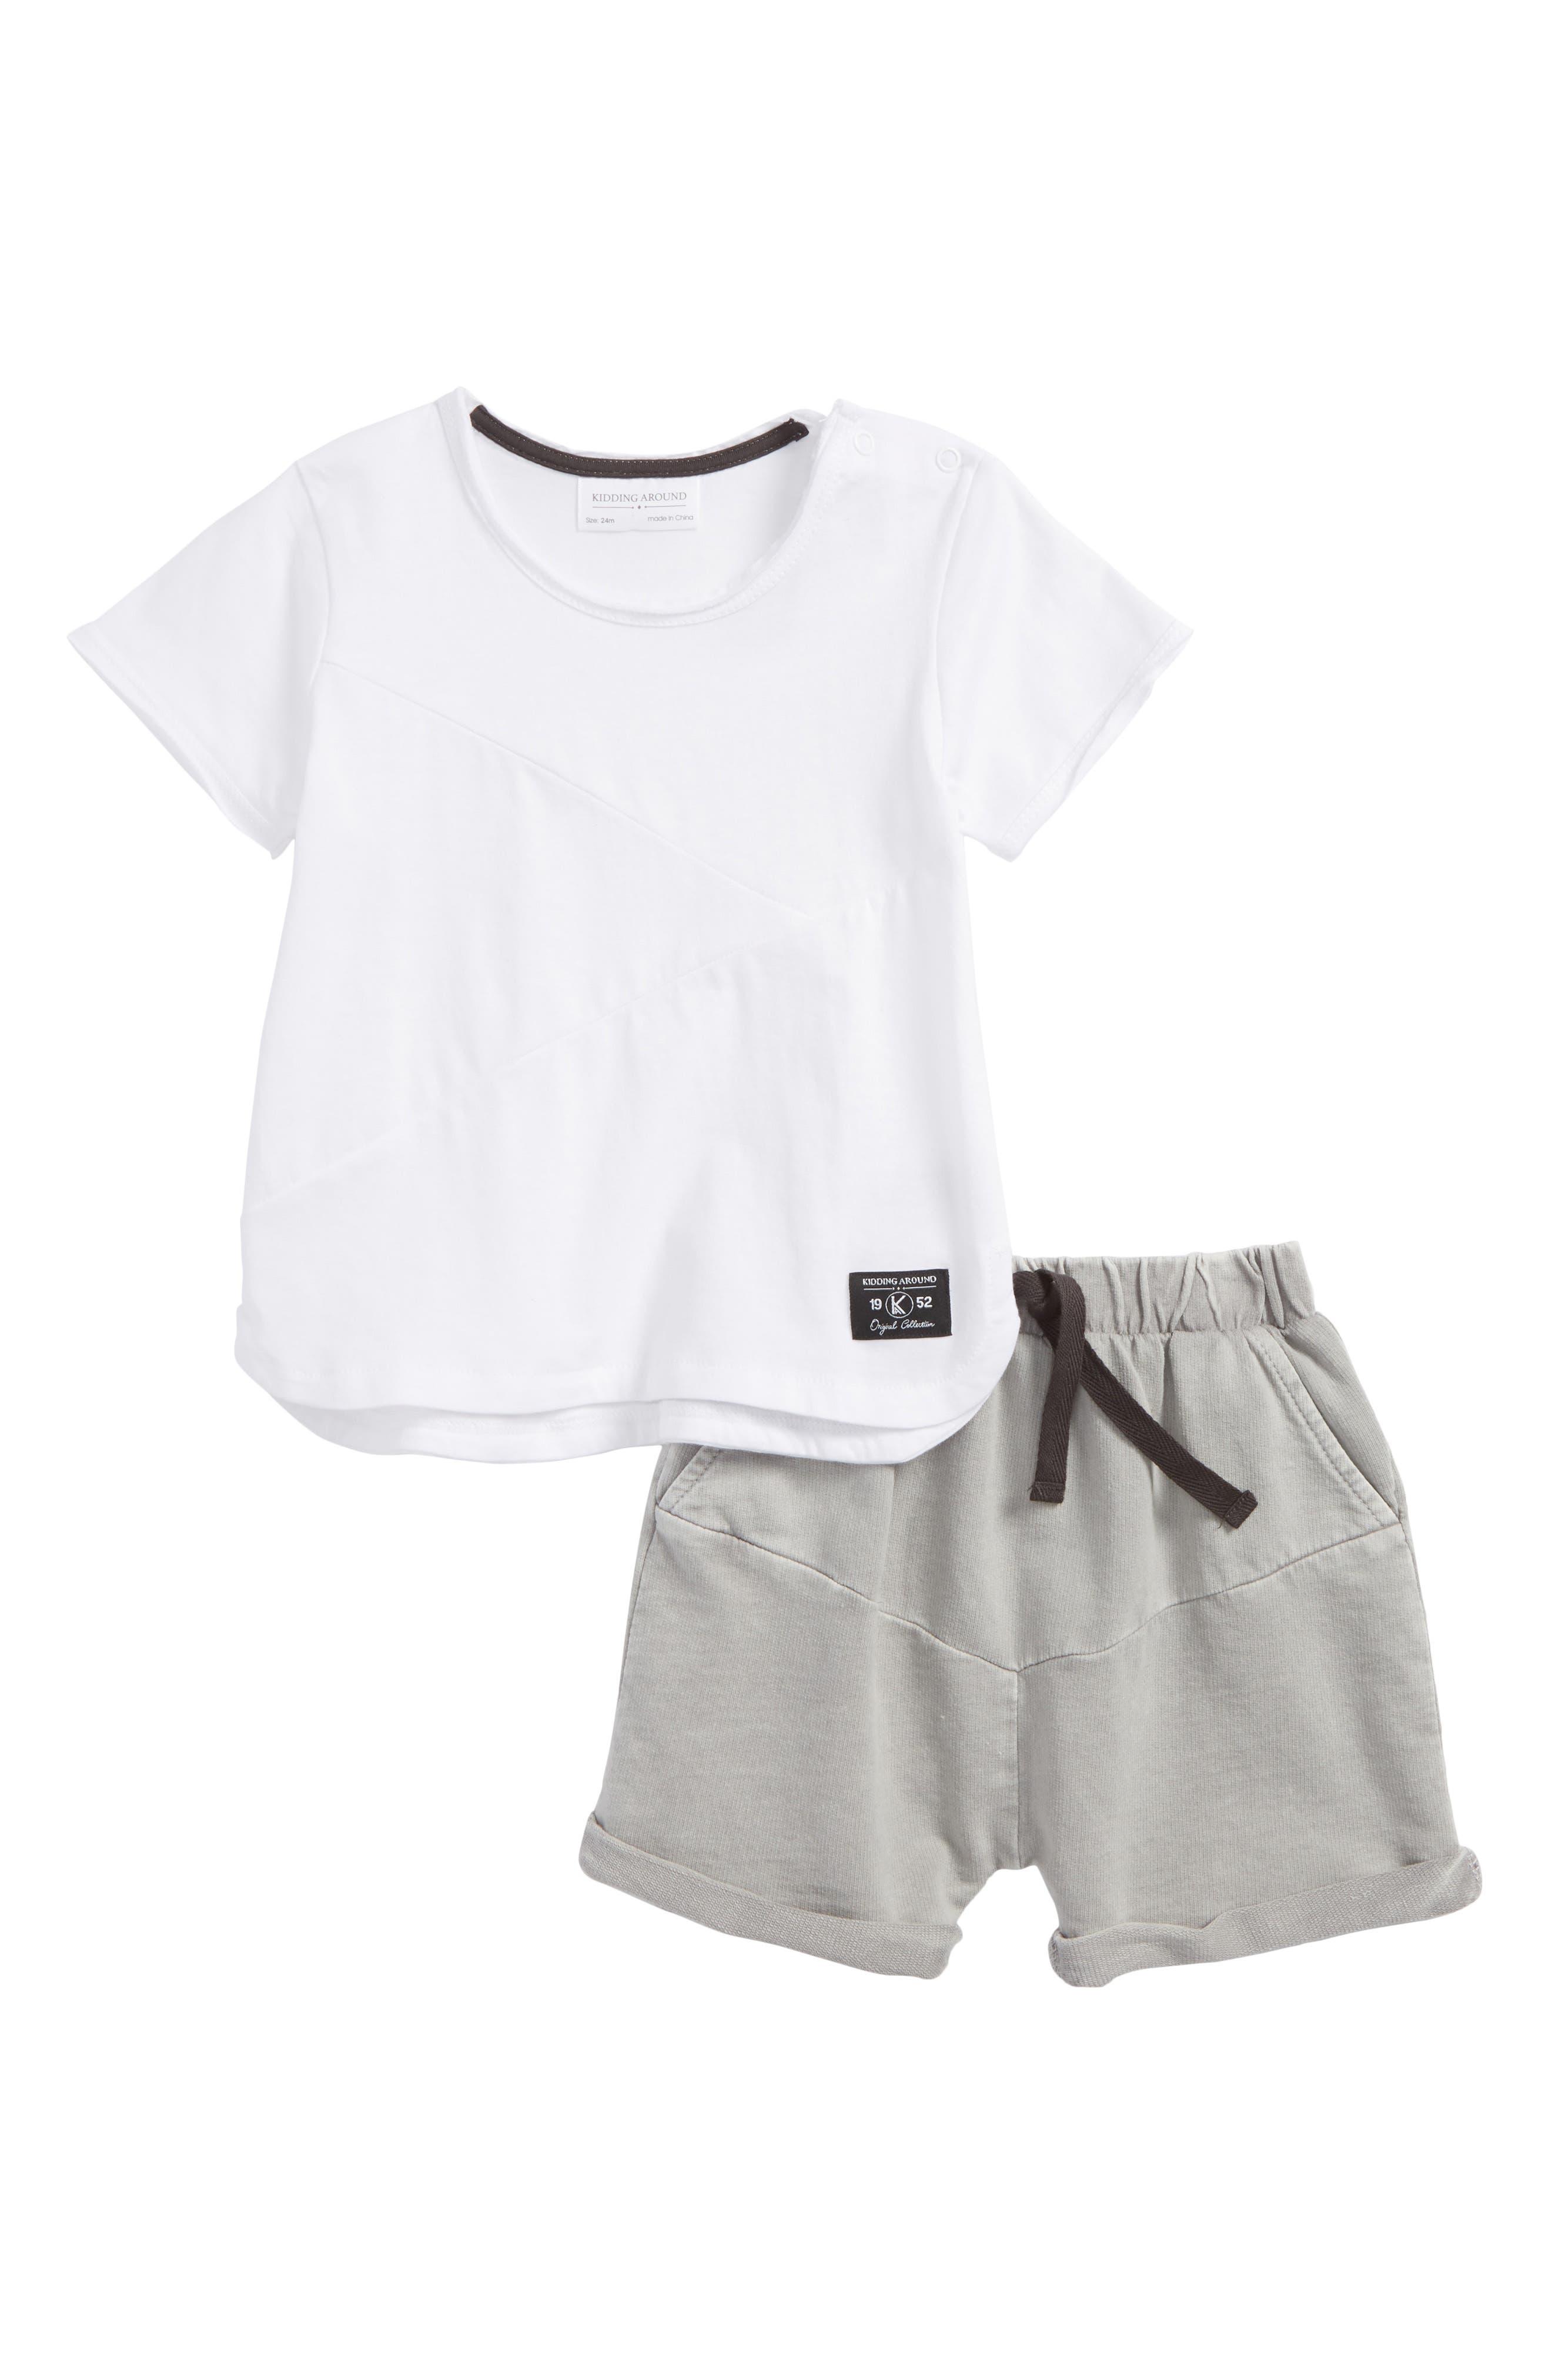 Alternate Image 1 Selected - Kidding Around T-Shirt & Shorts Set (Baby)